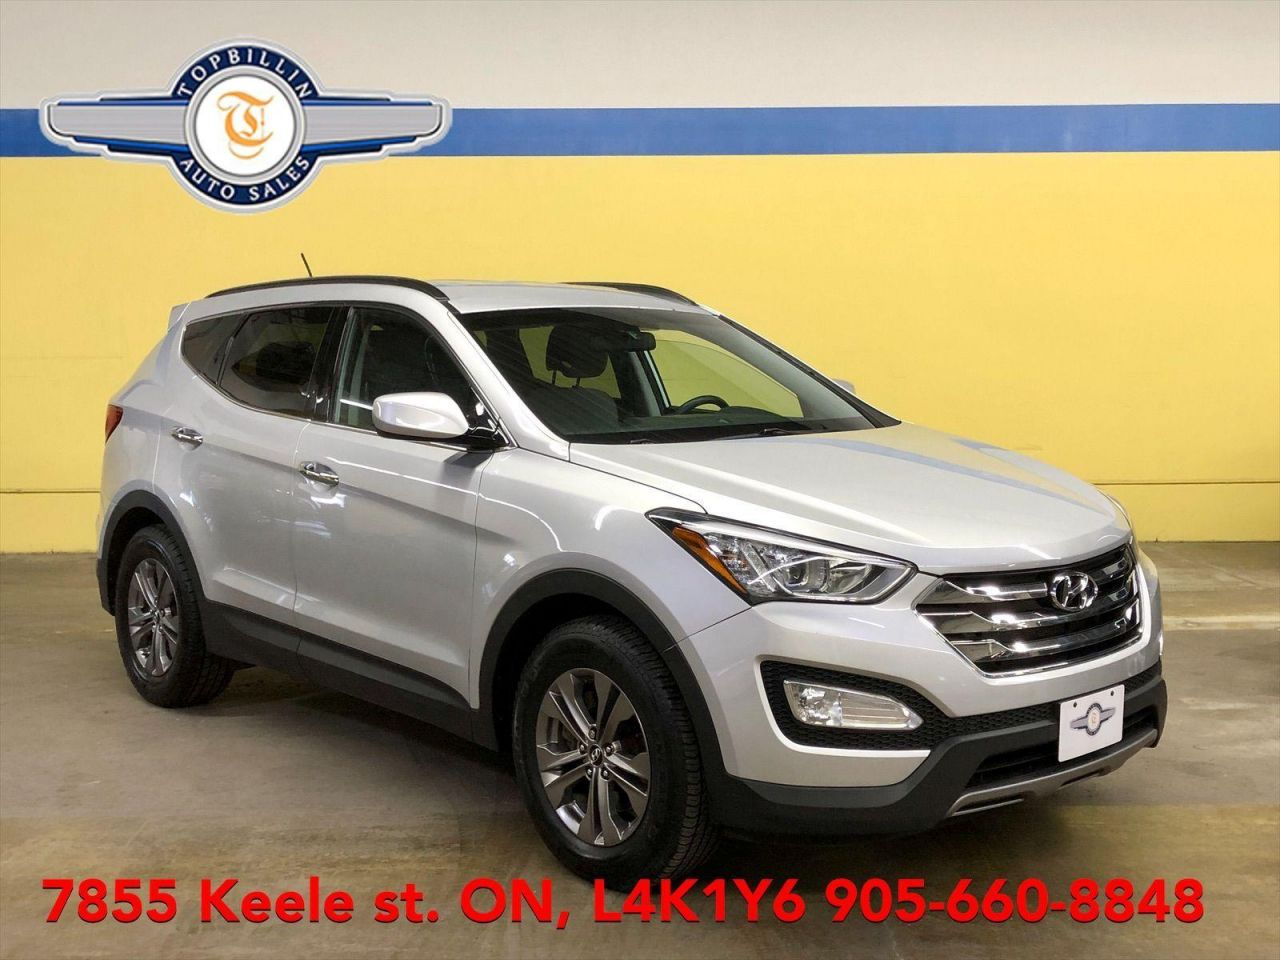 2013 Hyundai Santa Fe Only 80K Km, 2 Years Warranty, Bluetooth